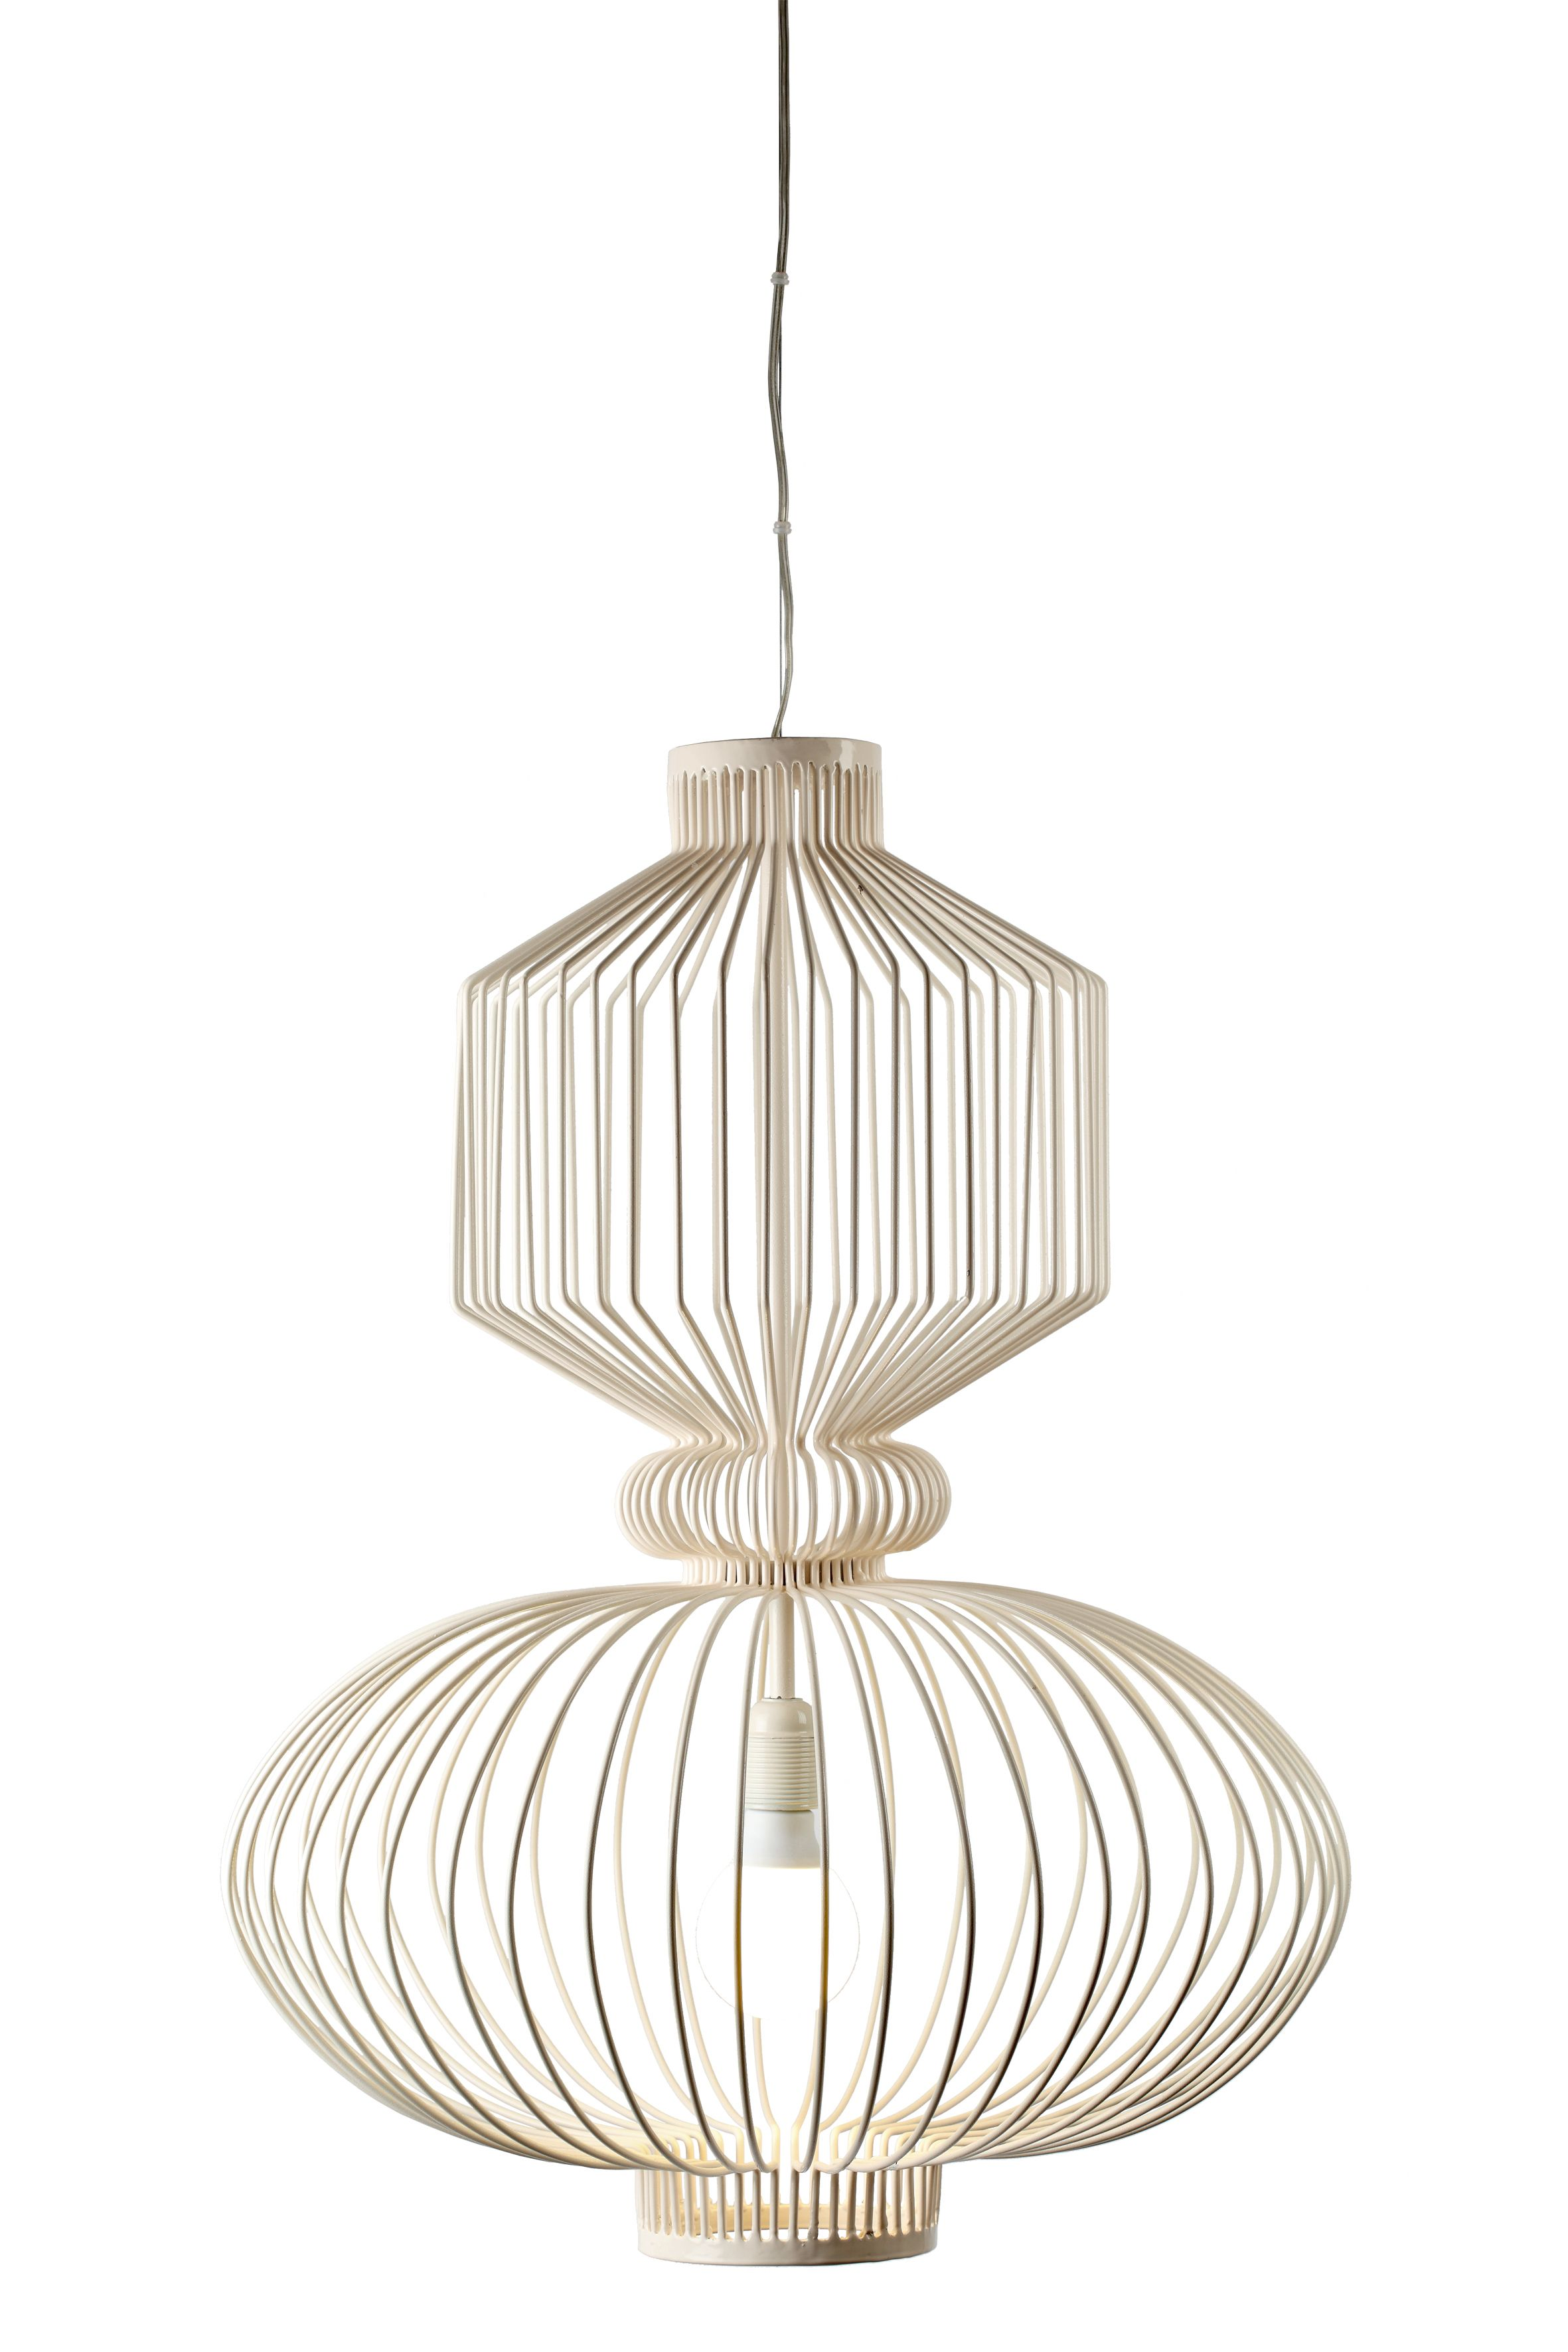 Suspension lamp Revolution, by Claudia Melo for Mambo's ETTERO Collection